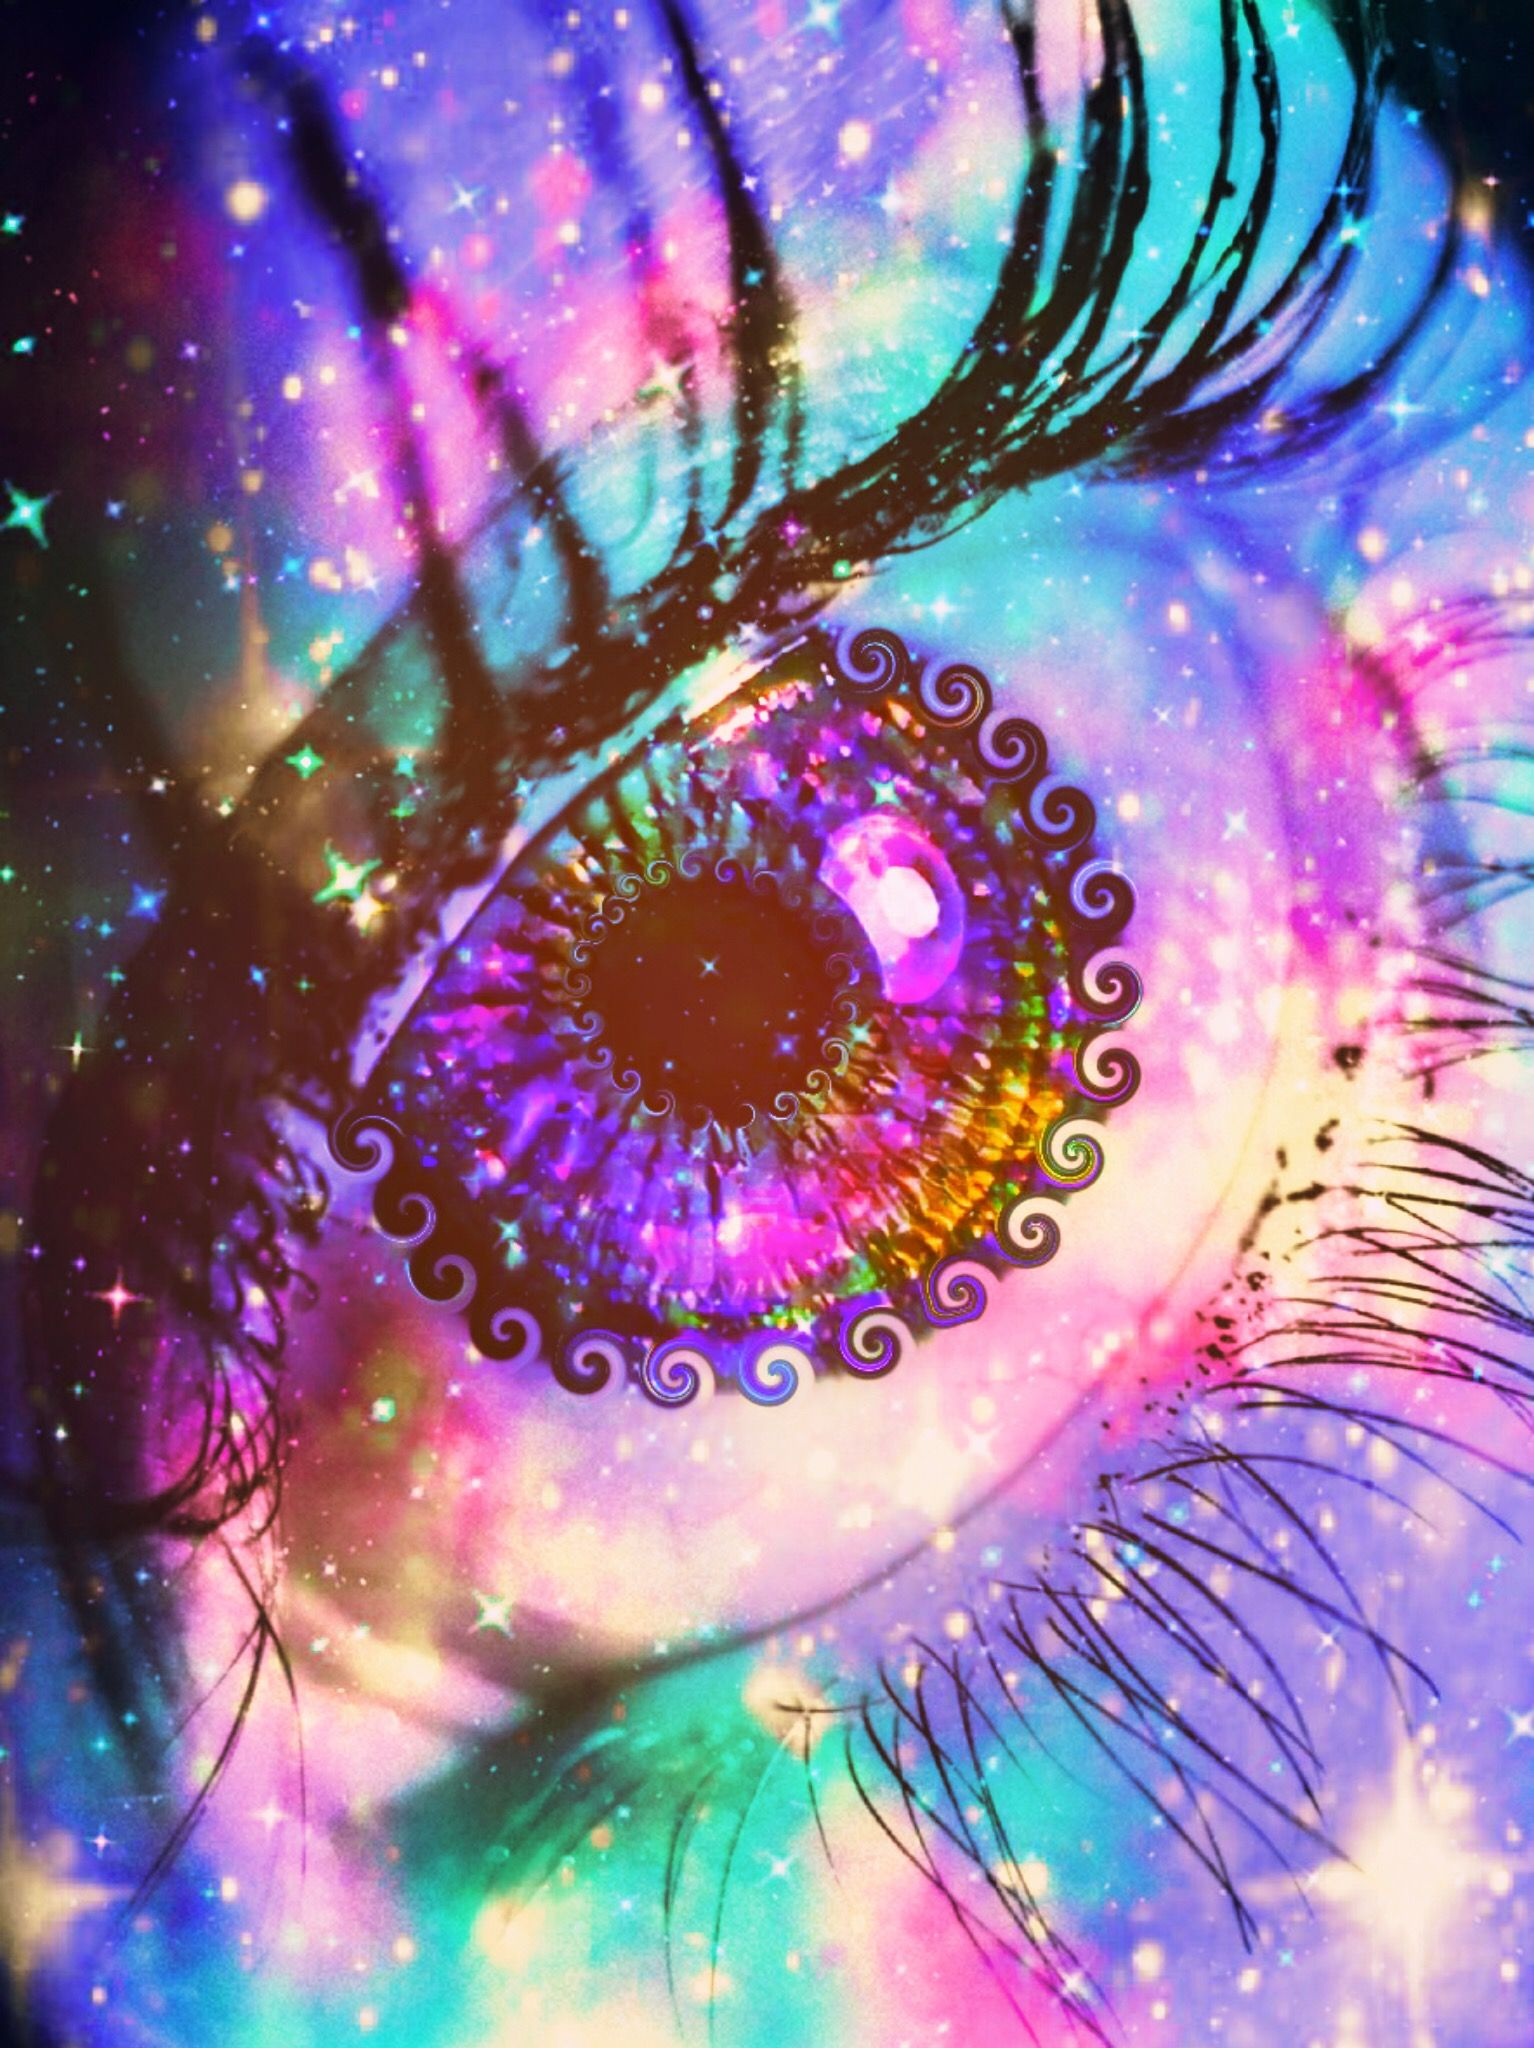 Wallpaper Lockscreen Glitter Sparkle Colorful Galaxy Eye Shimmer Stars Rainbo Pink Polka Dots Wallpaper Iphone Wallpaper Tumblr Aesthetic Galaxy Eyes